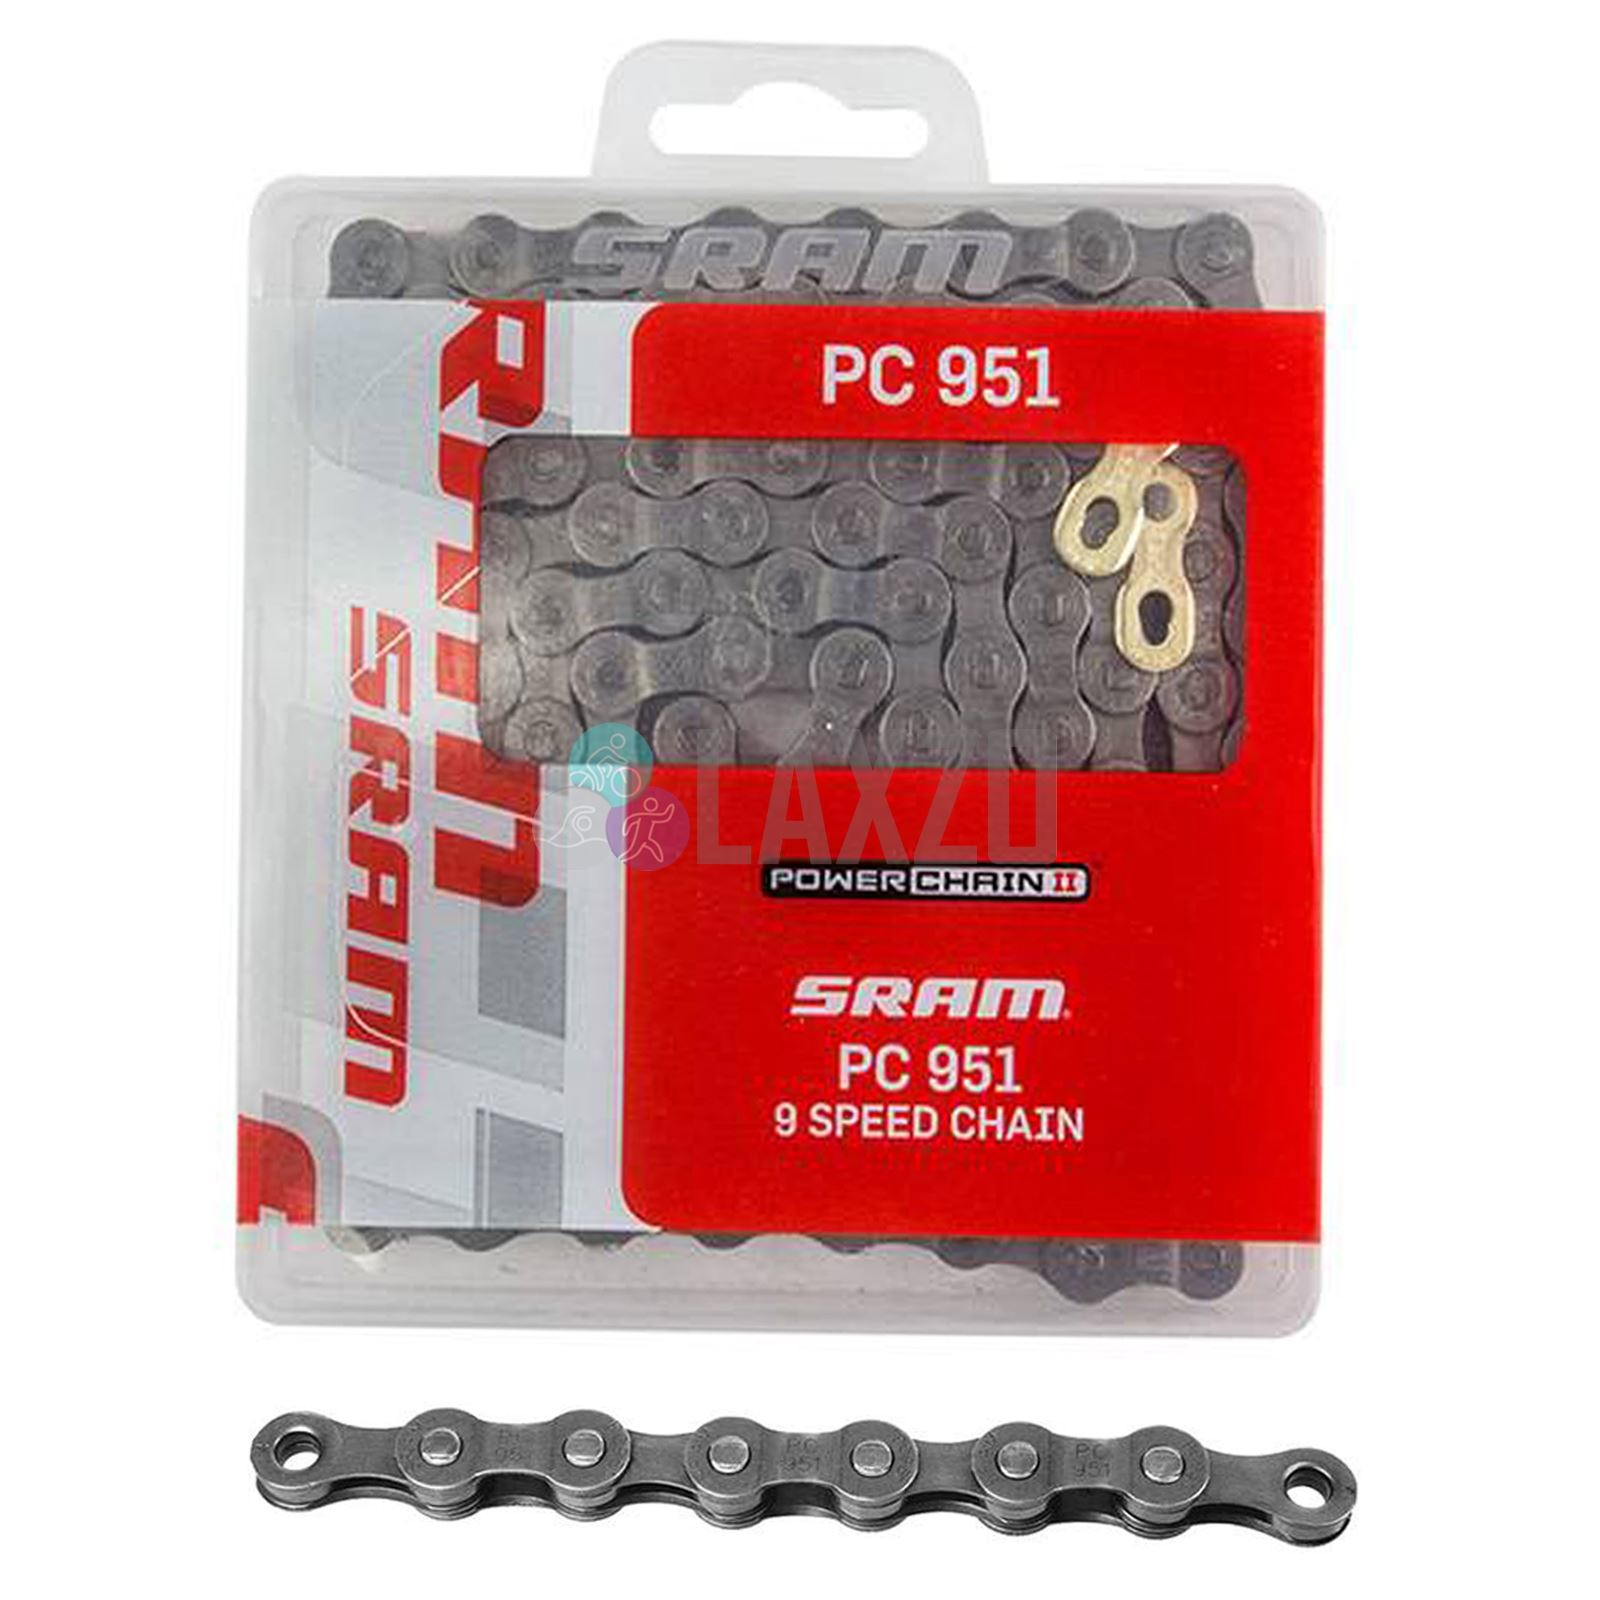 SRAM PC-971 PowerChain II 9 vitesses mtb chaîne vélo cycle neuf